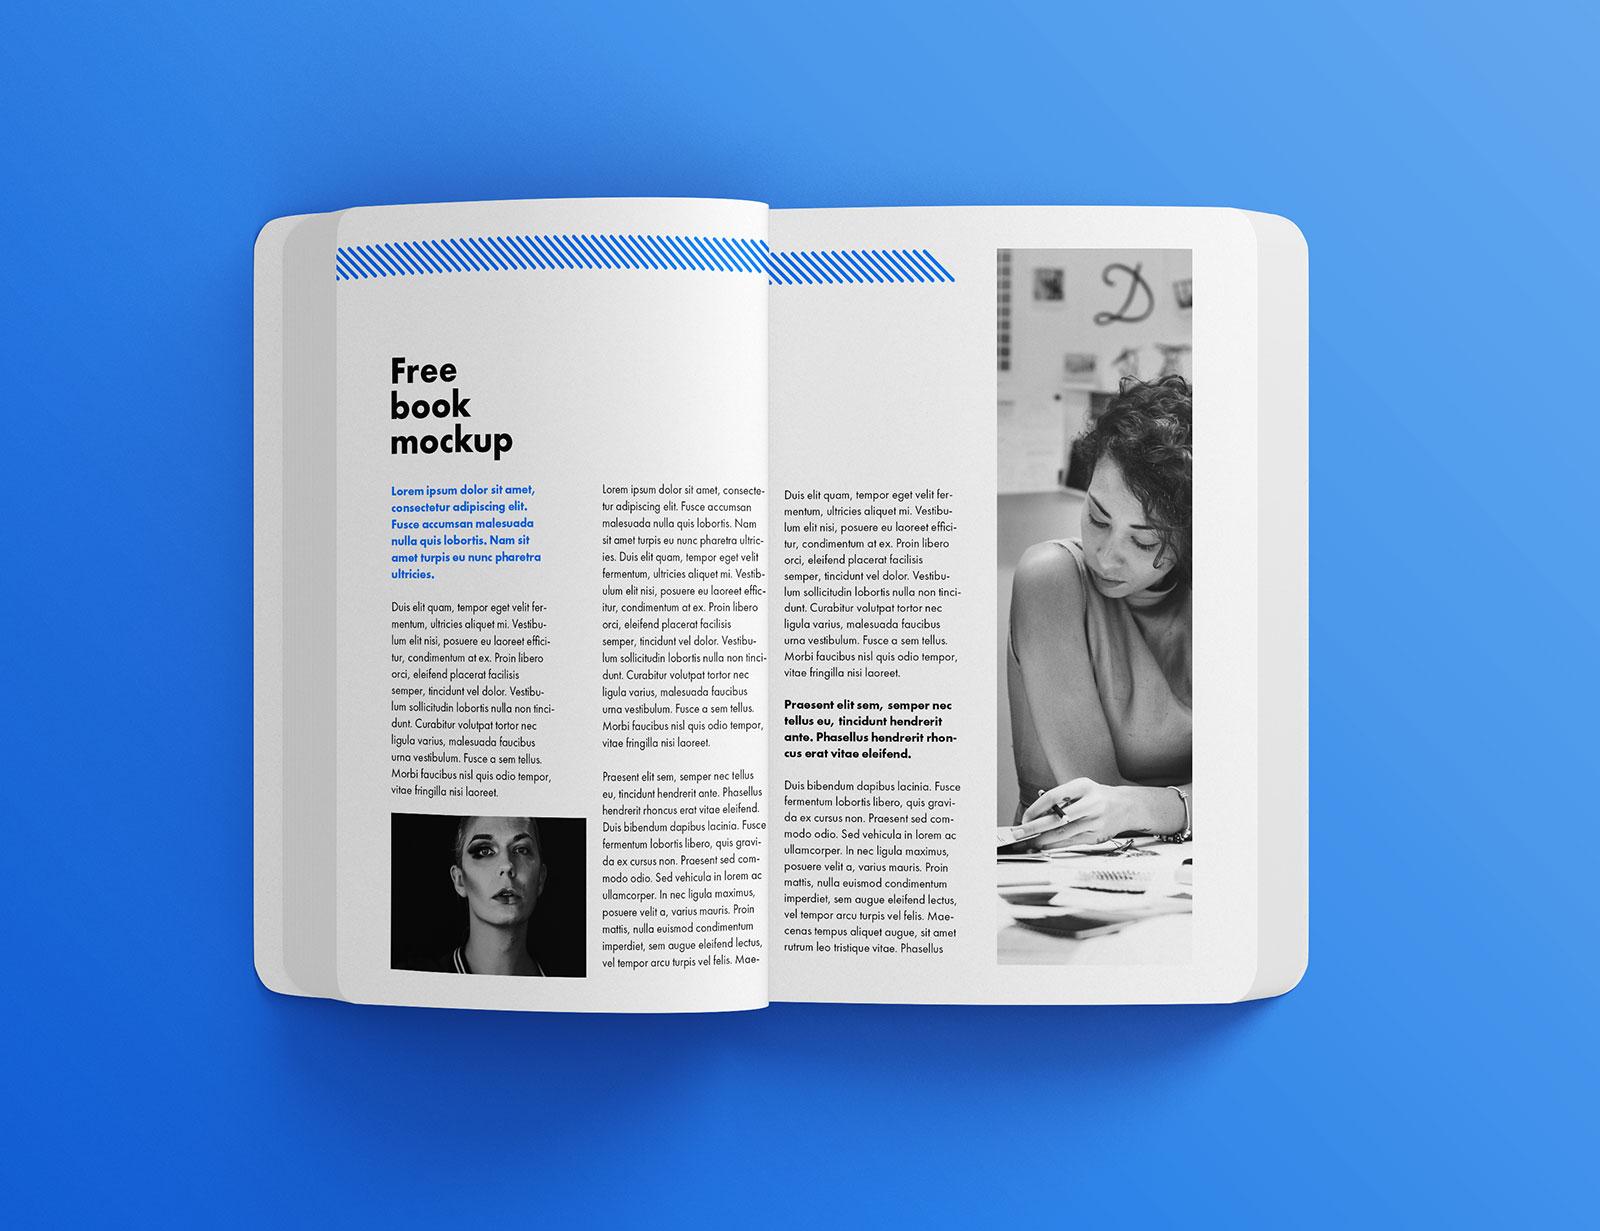 Free-Rounded-Corner-Paperback-Book-Mockup-PSD-Set-2